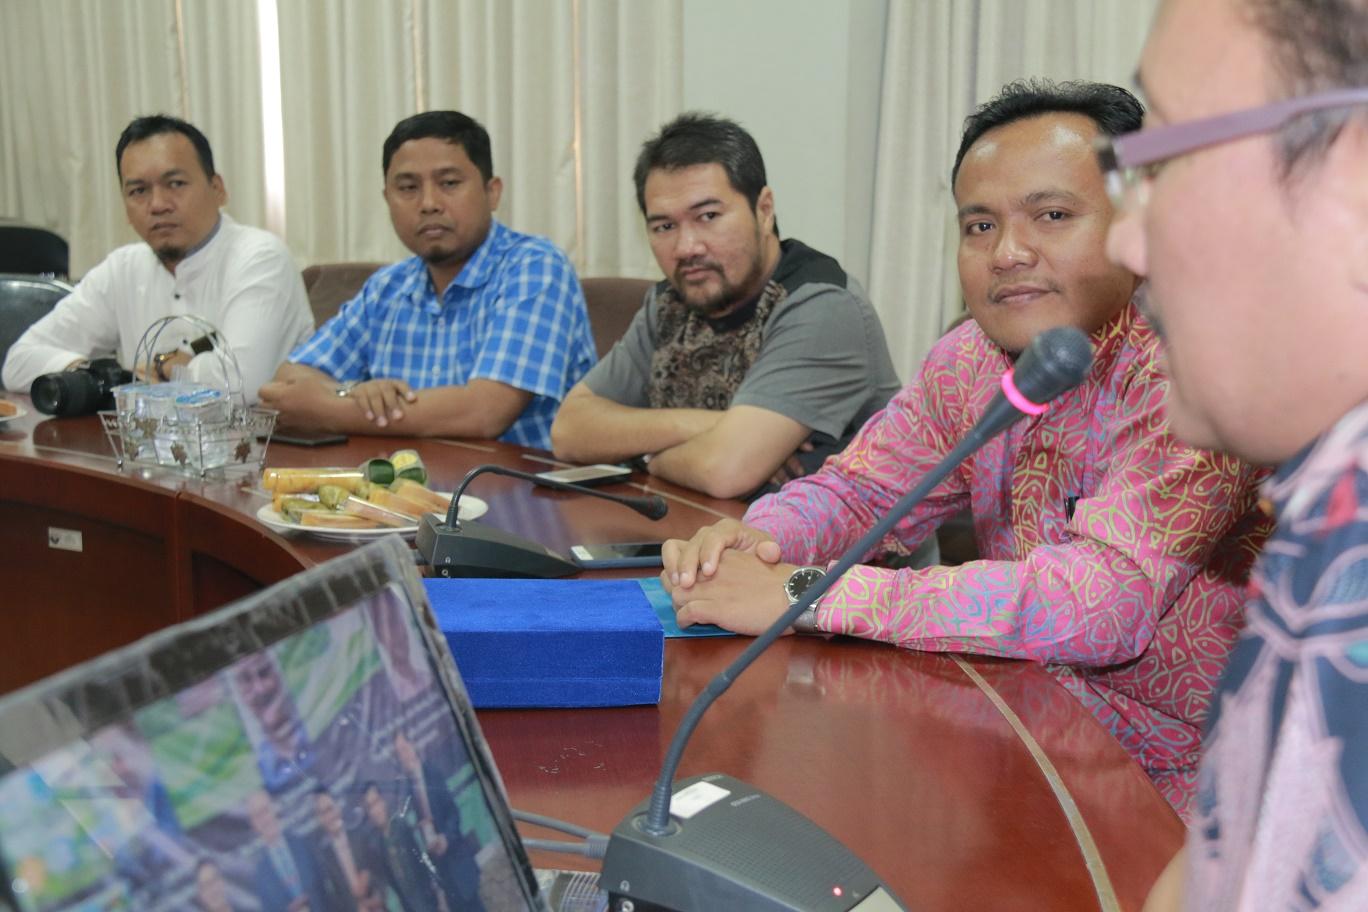 Pengelola Website dan Humas Unimed Kunjungi Kantor Humas UPI